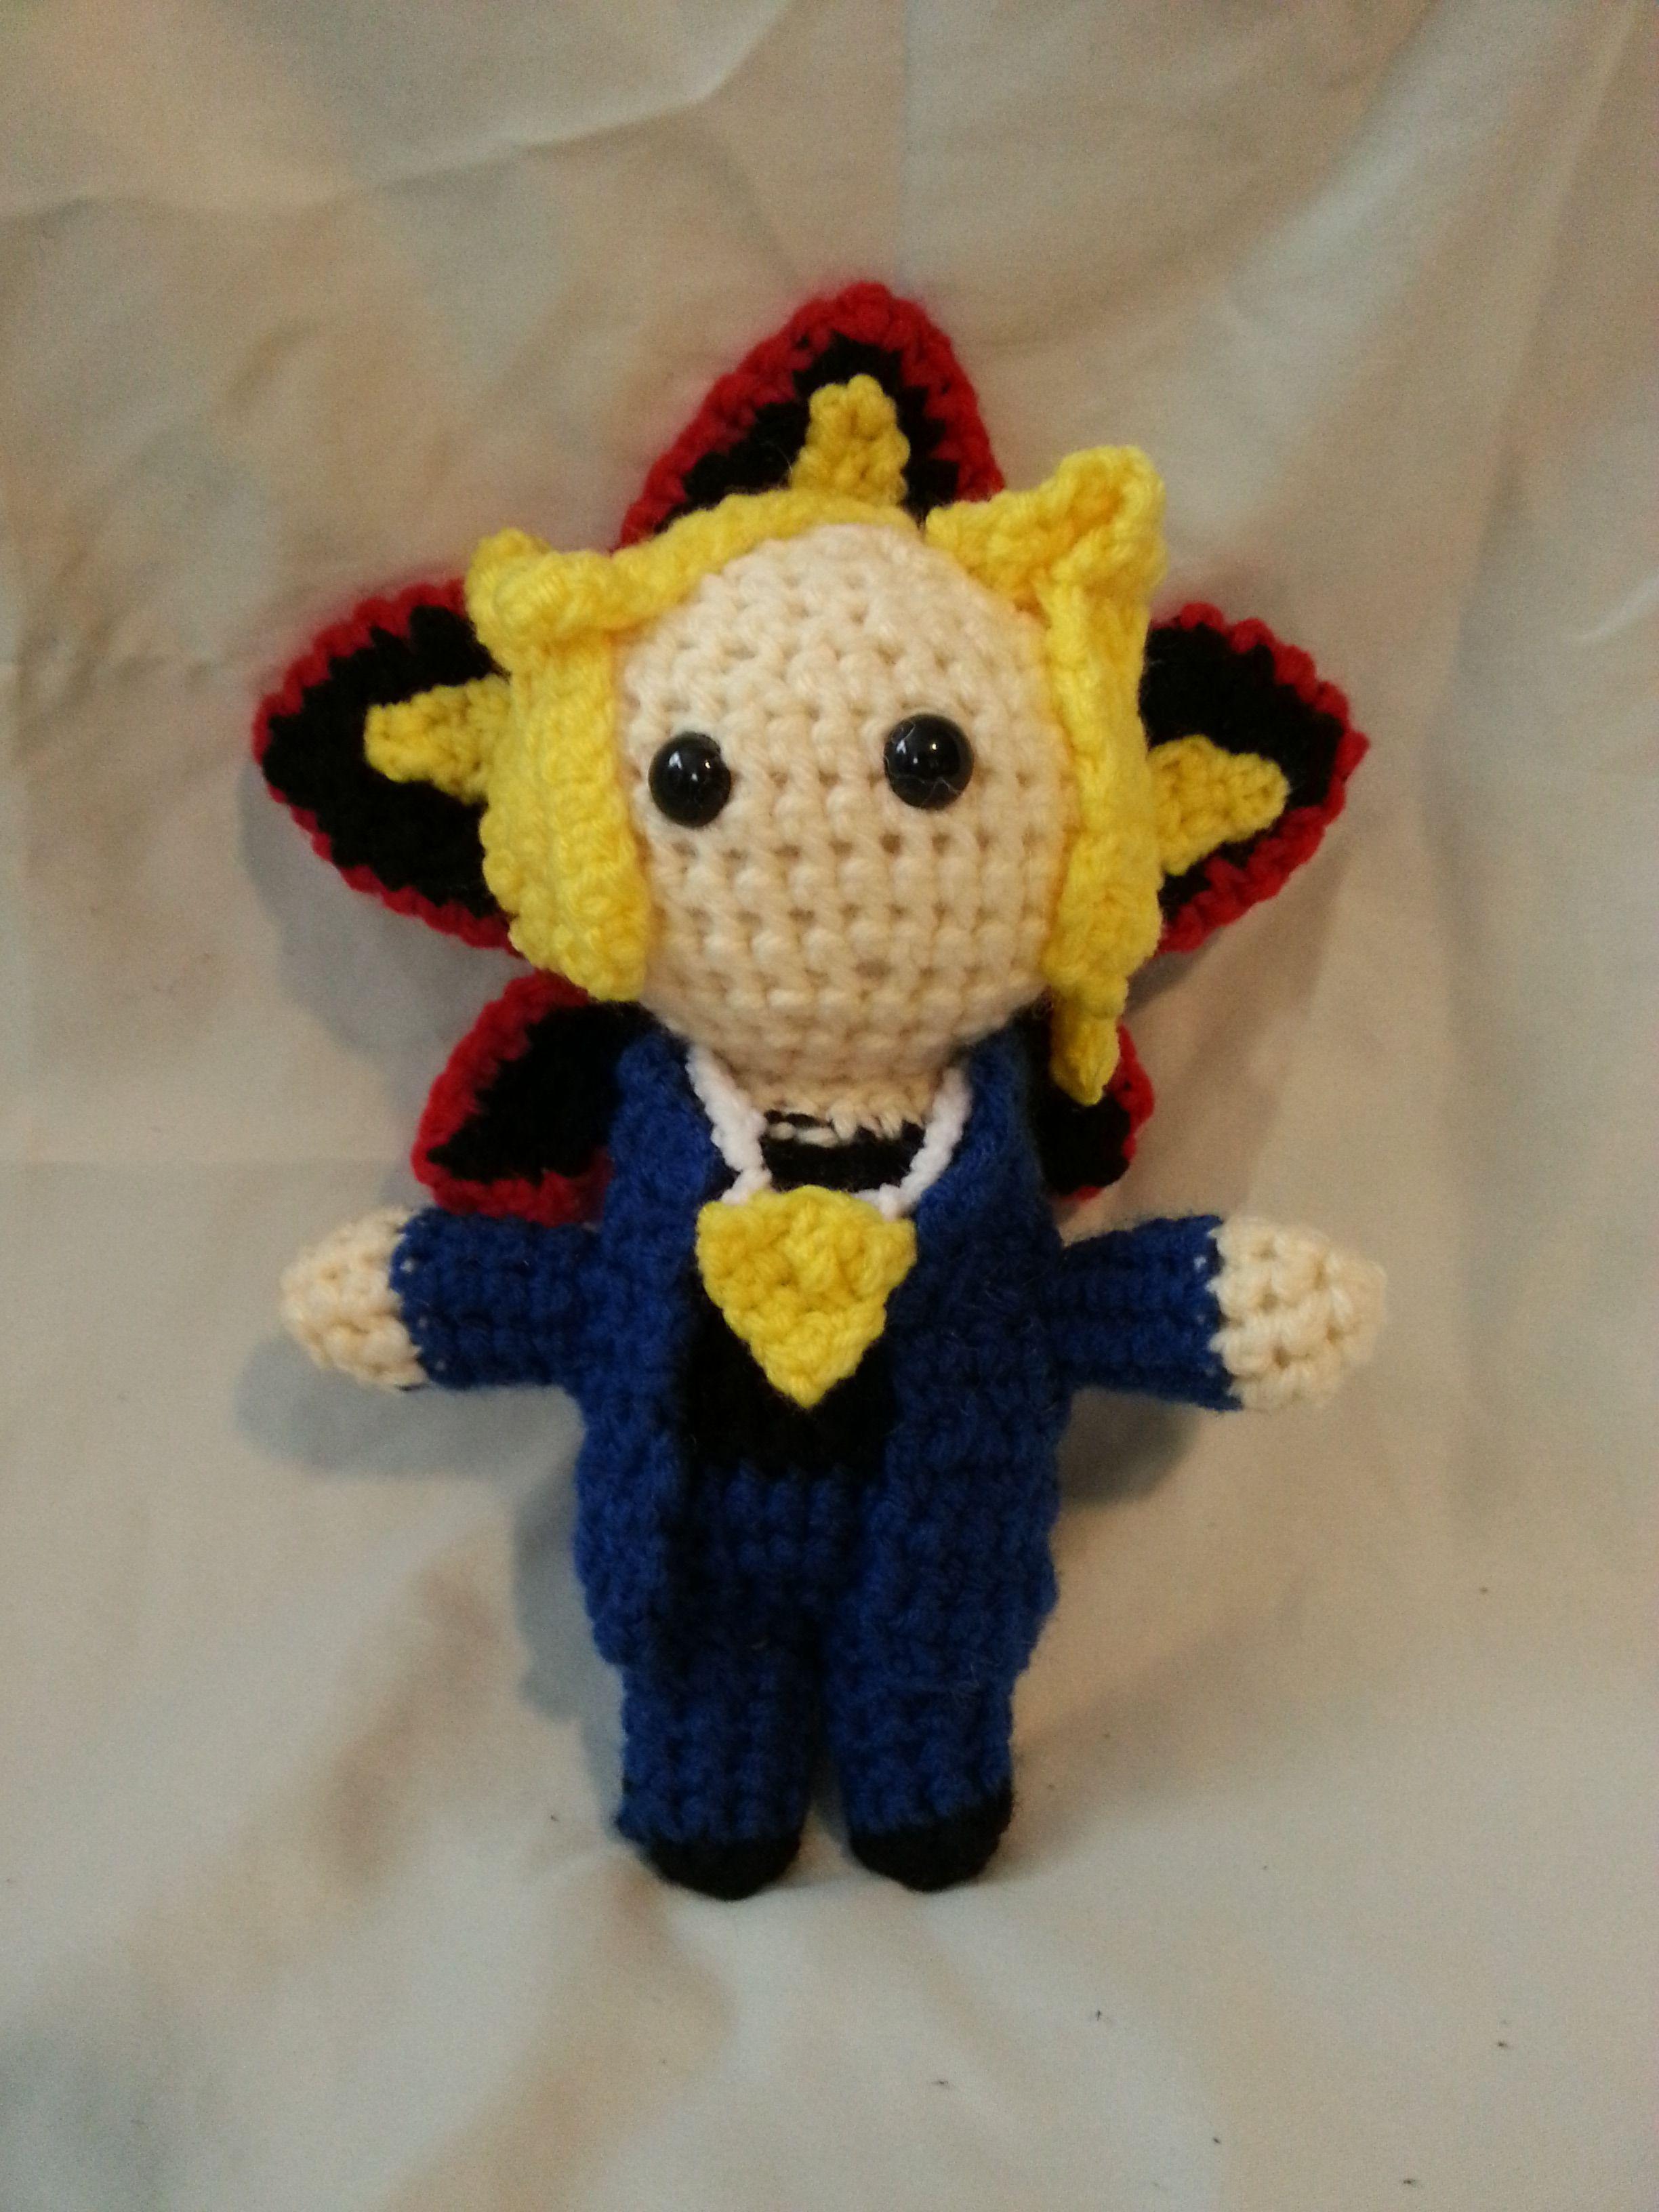 Yugioh Amigurumi Amigurumi Pinterest Crochet Knitting And